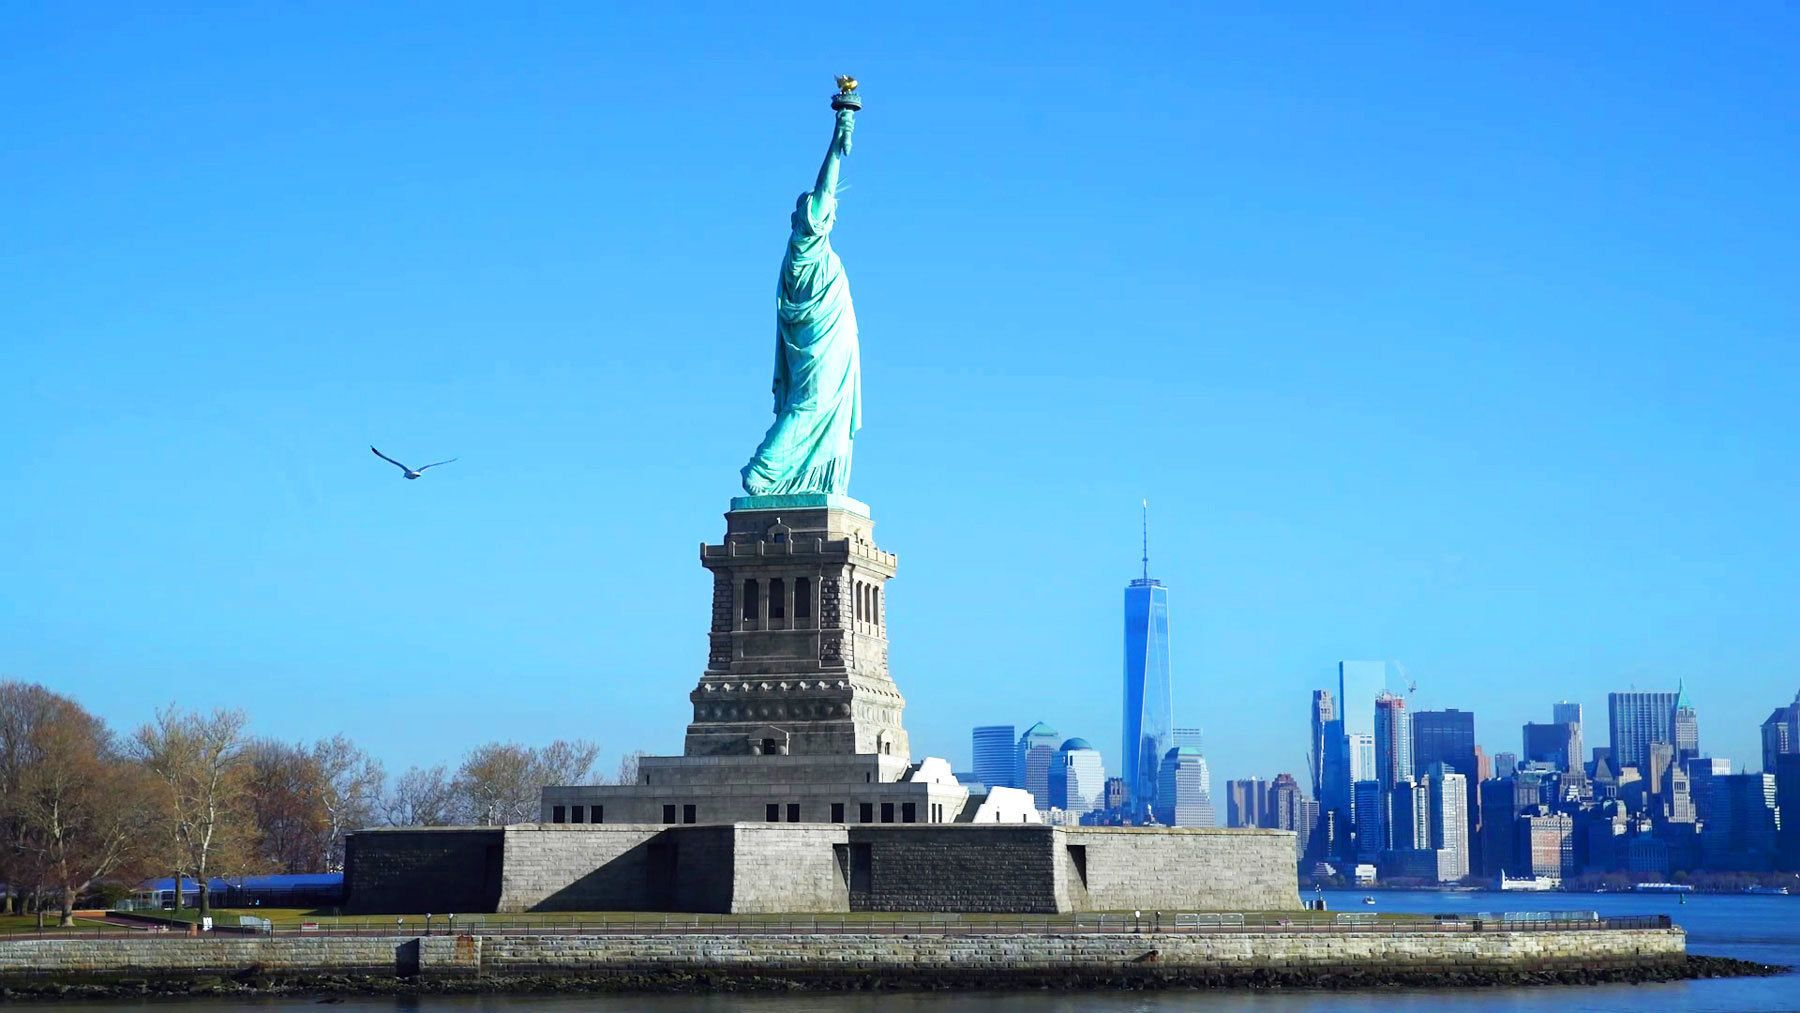 Statue of Liberty on Ellis Island